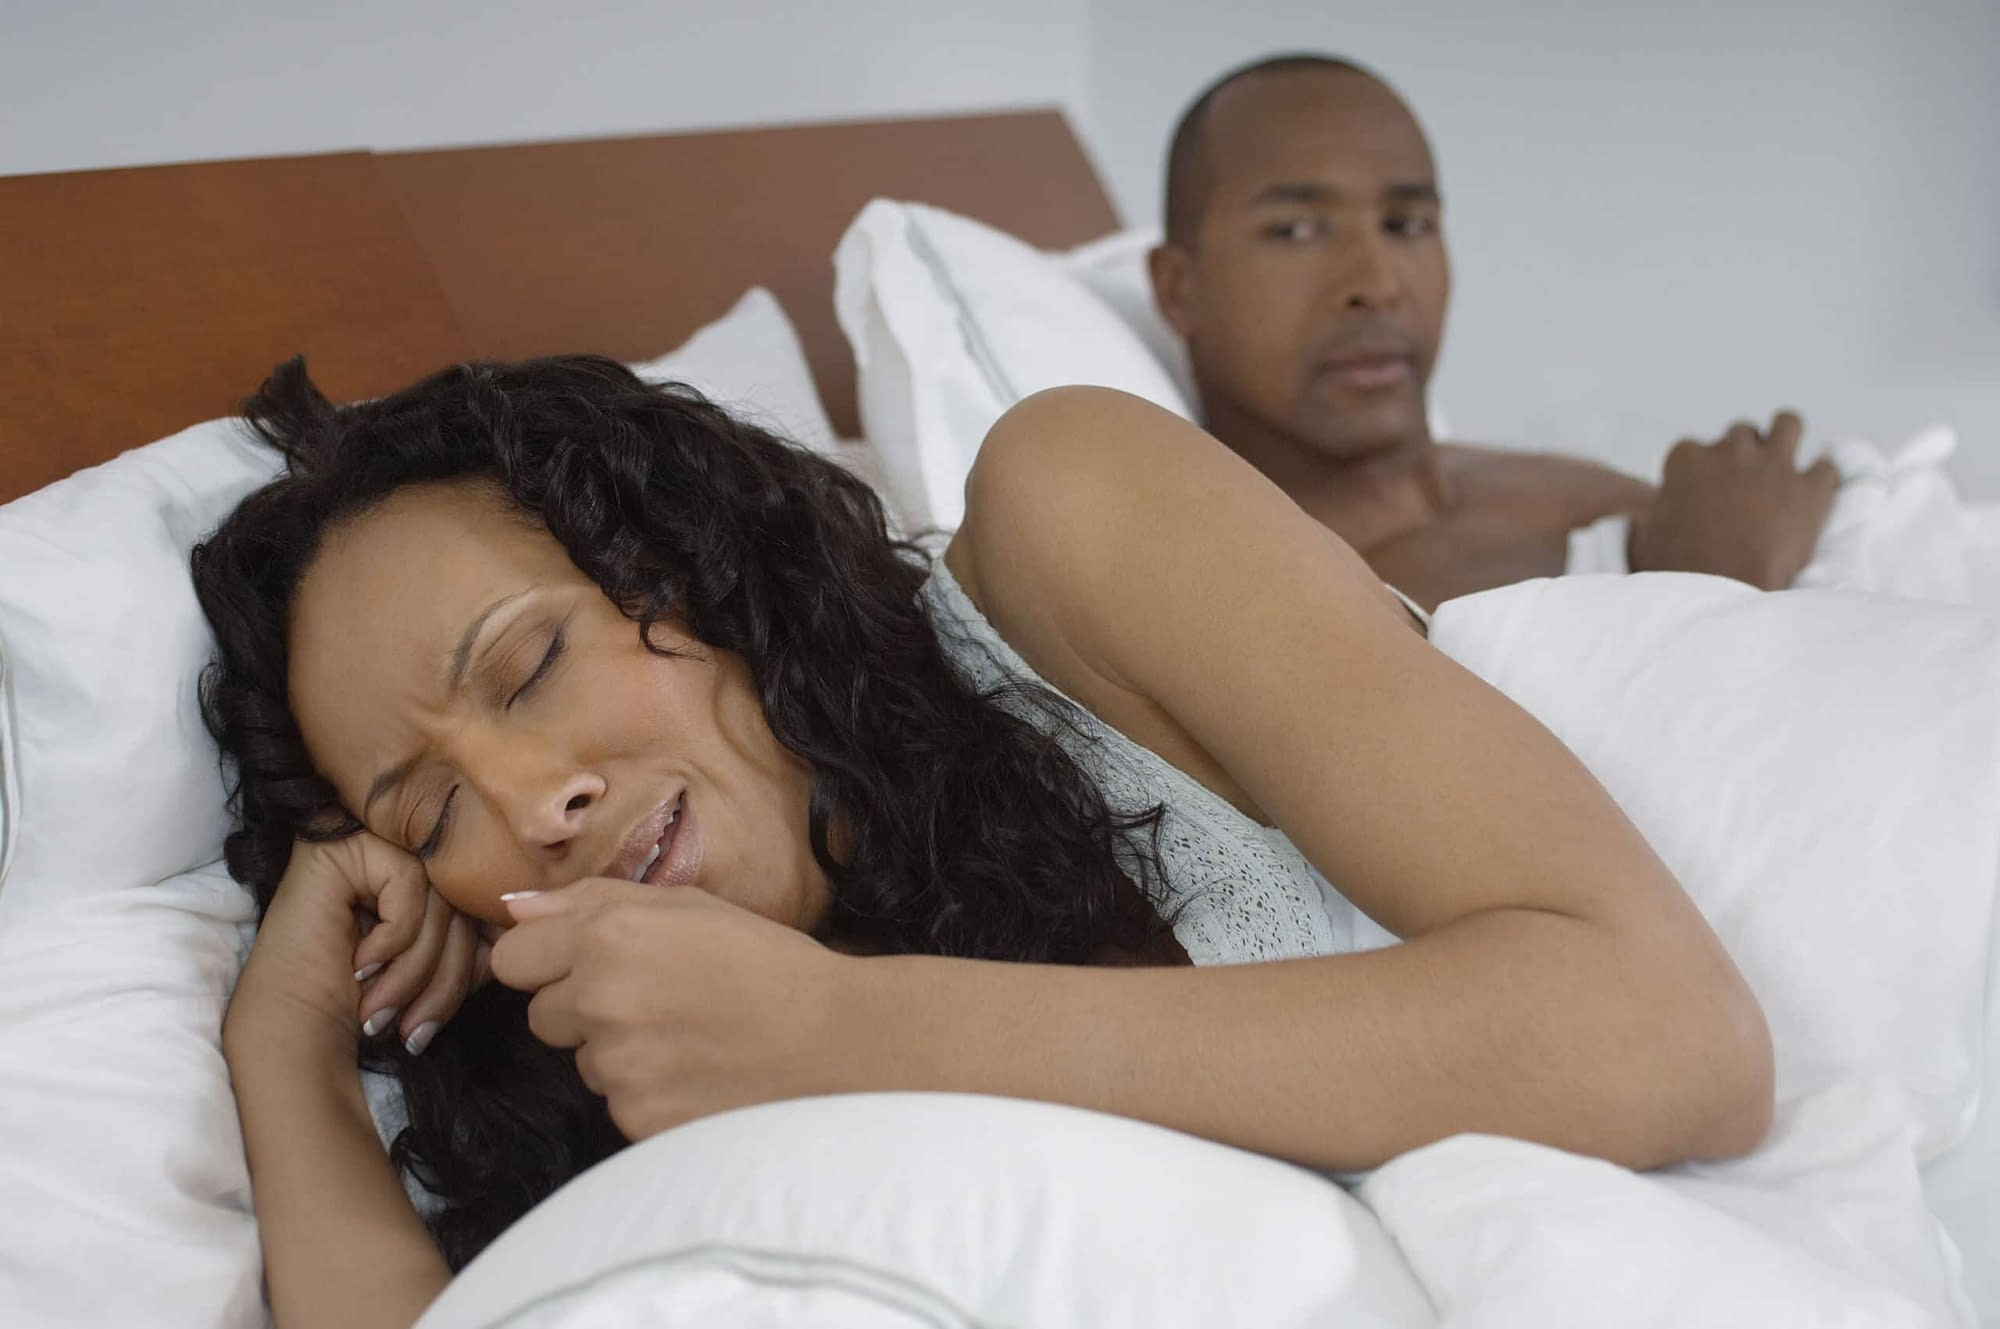 Upset woman rejected sex